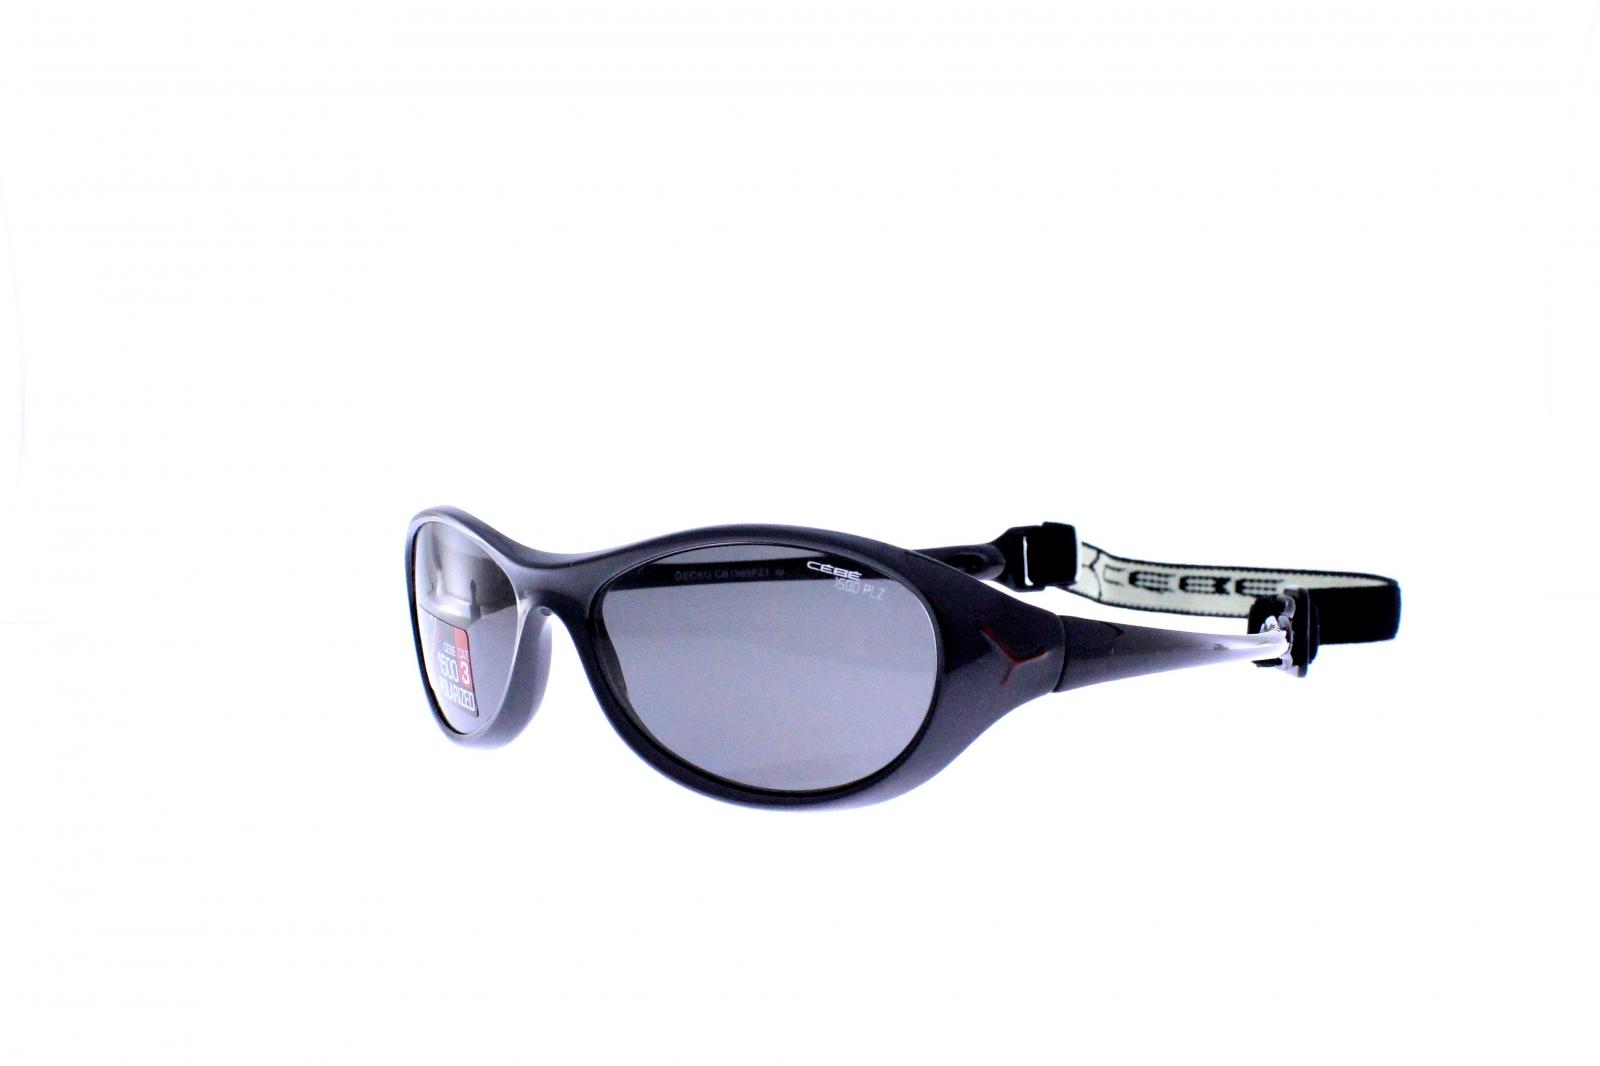 lunette ray ban junior pas cher